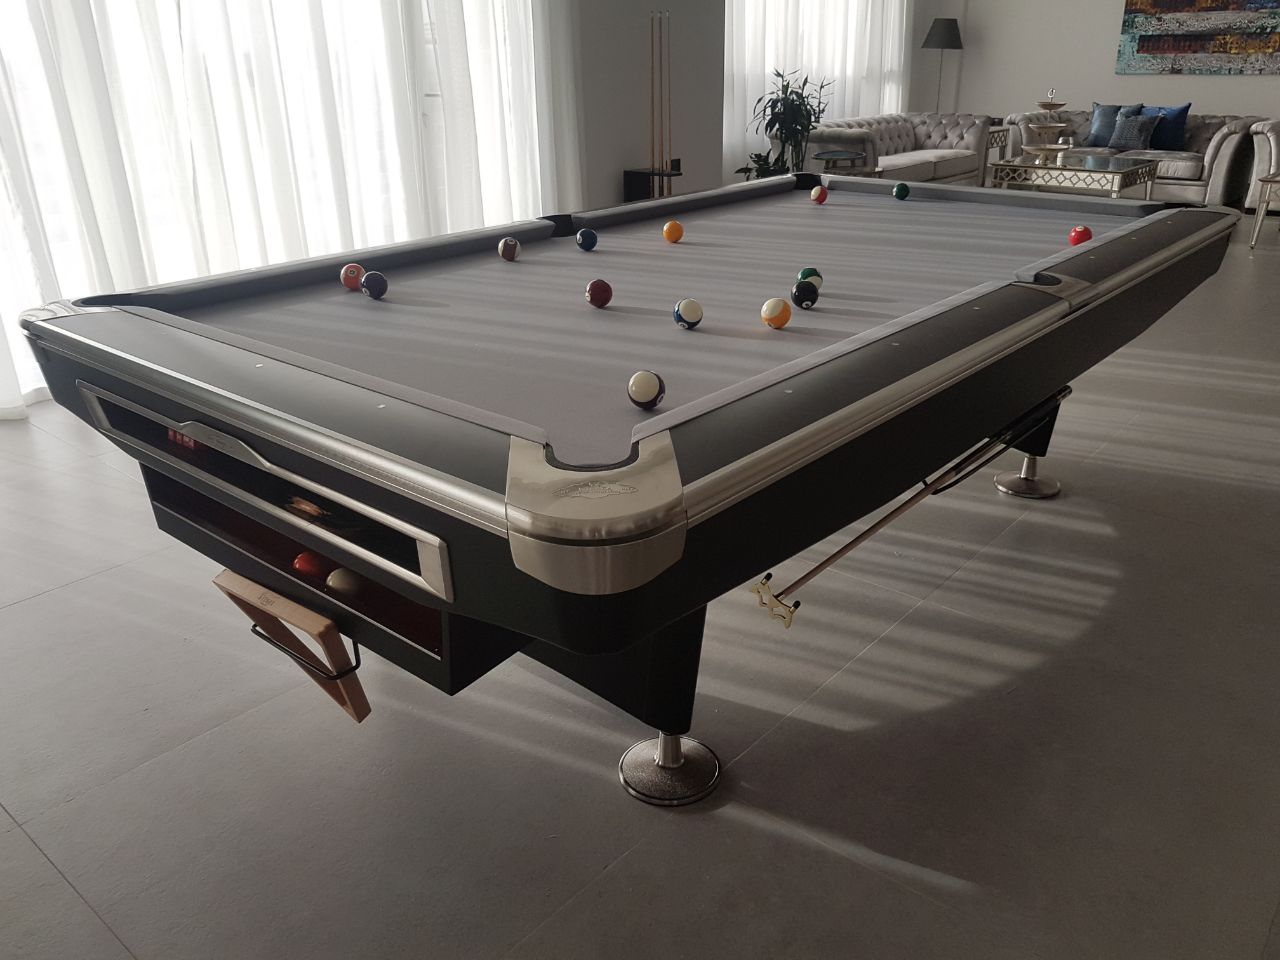 Wiraka Pool Tables Buy Pool Table Foosball Snooker Billiard Tables Dubai Middle East Africa Interpool